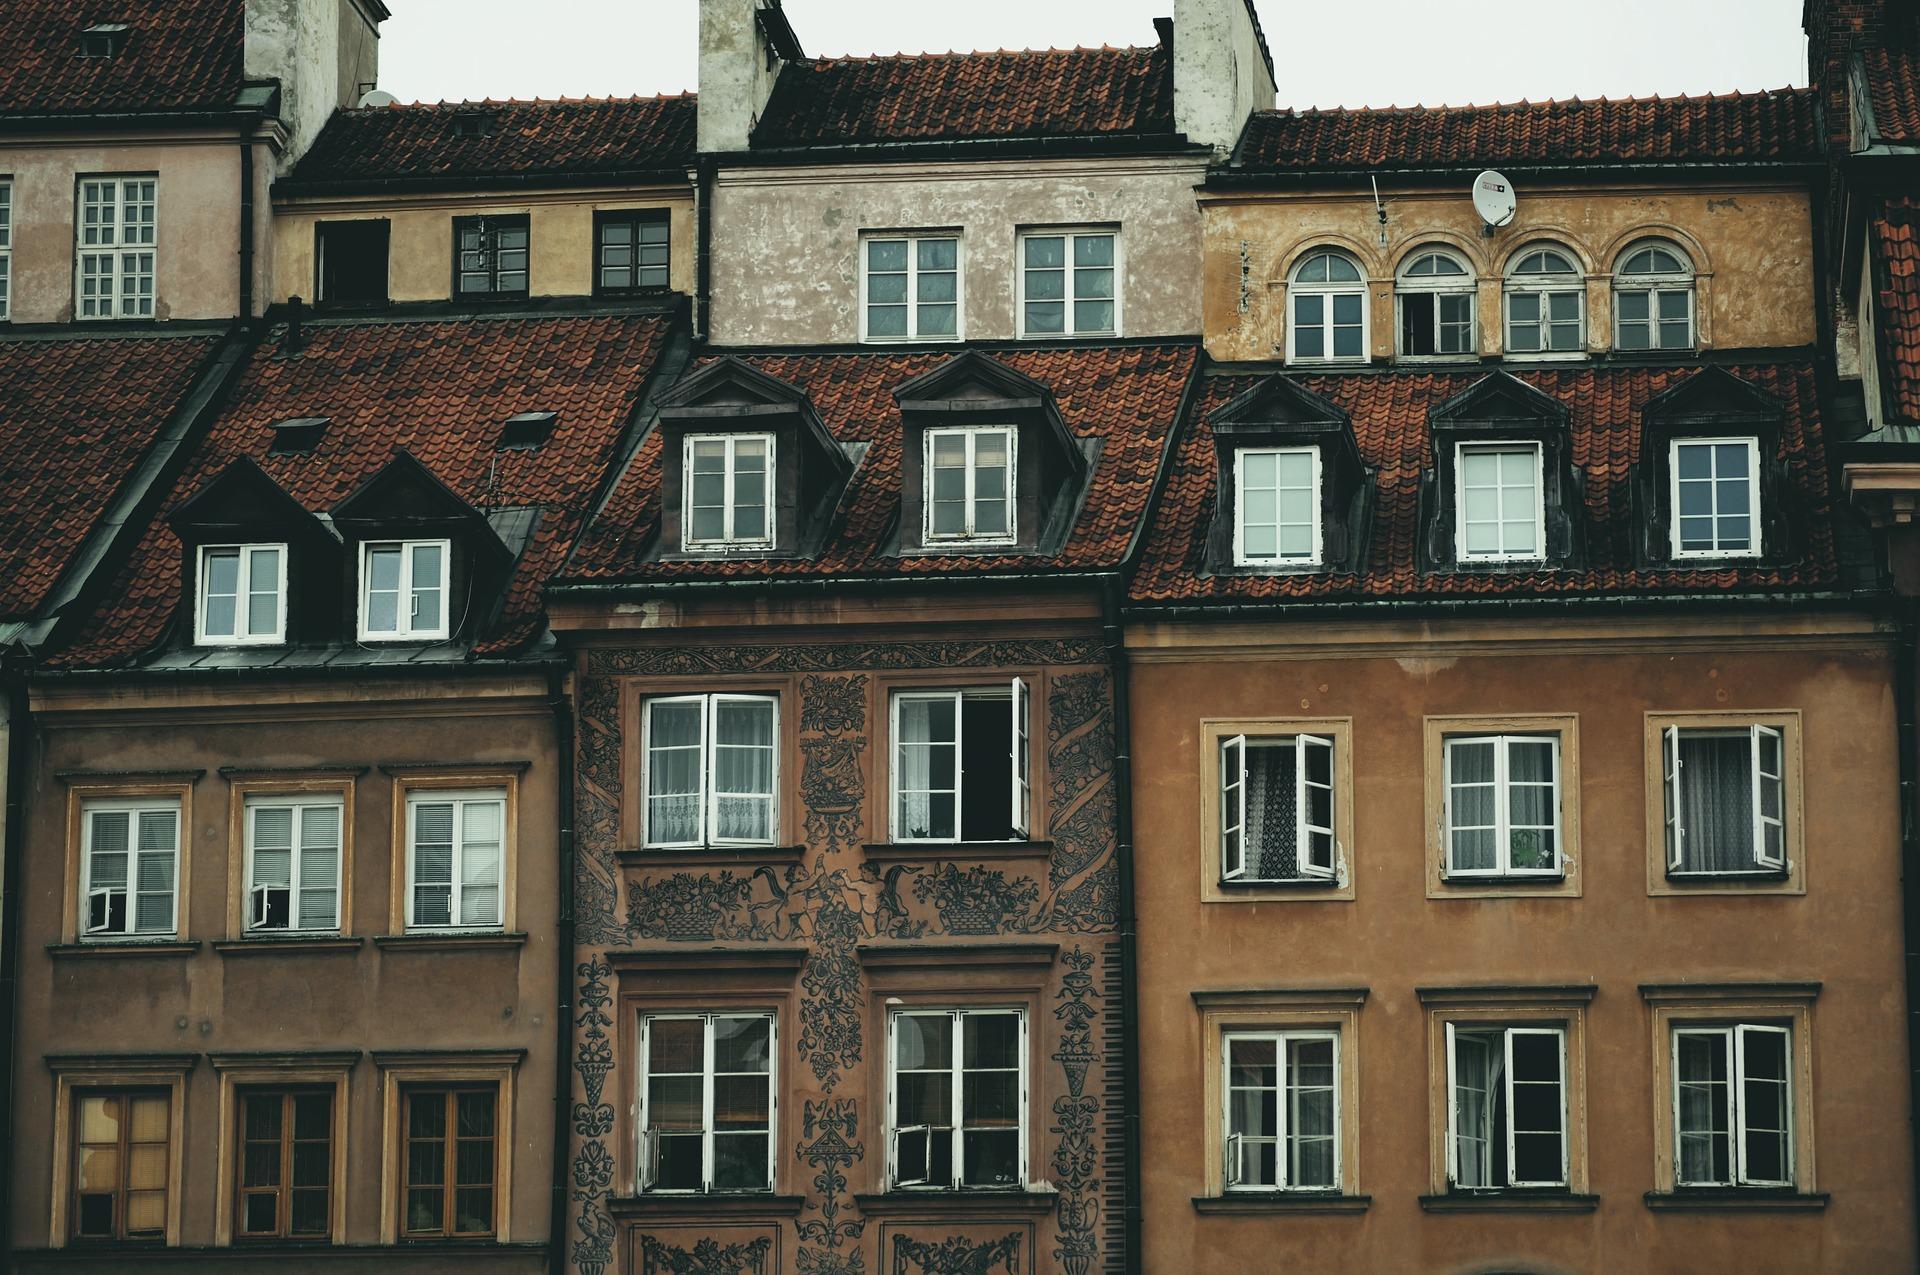 Moabit Immobilienpreis: Statistik Berlin